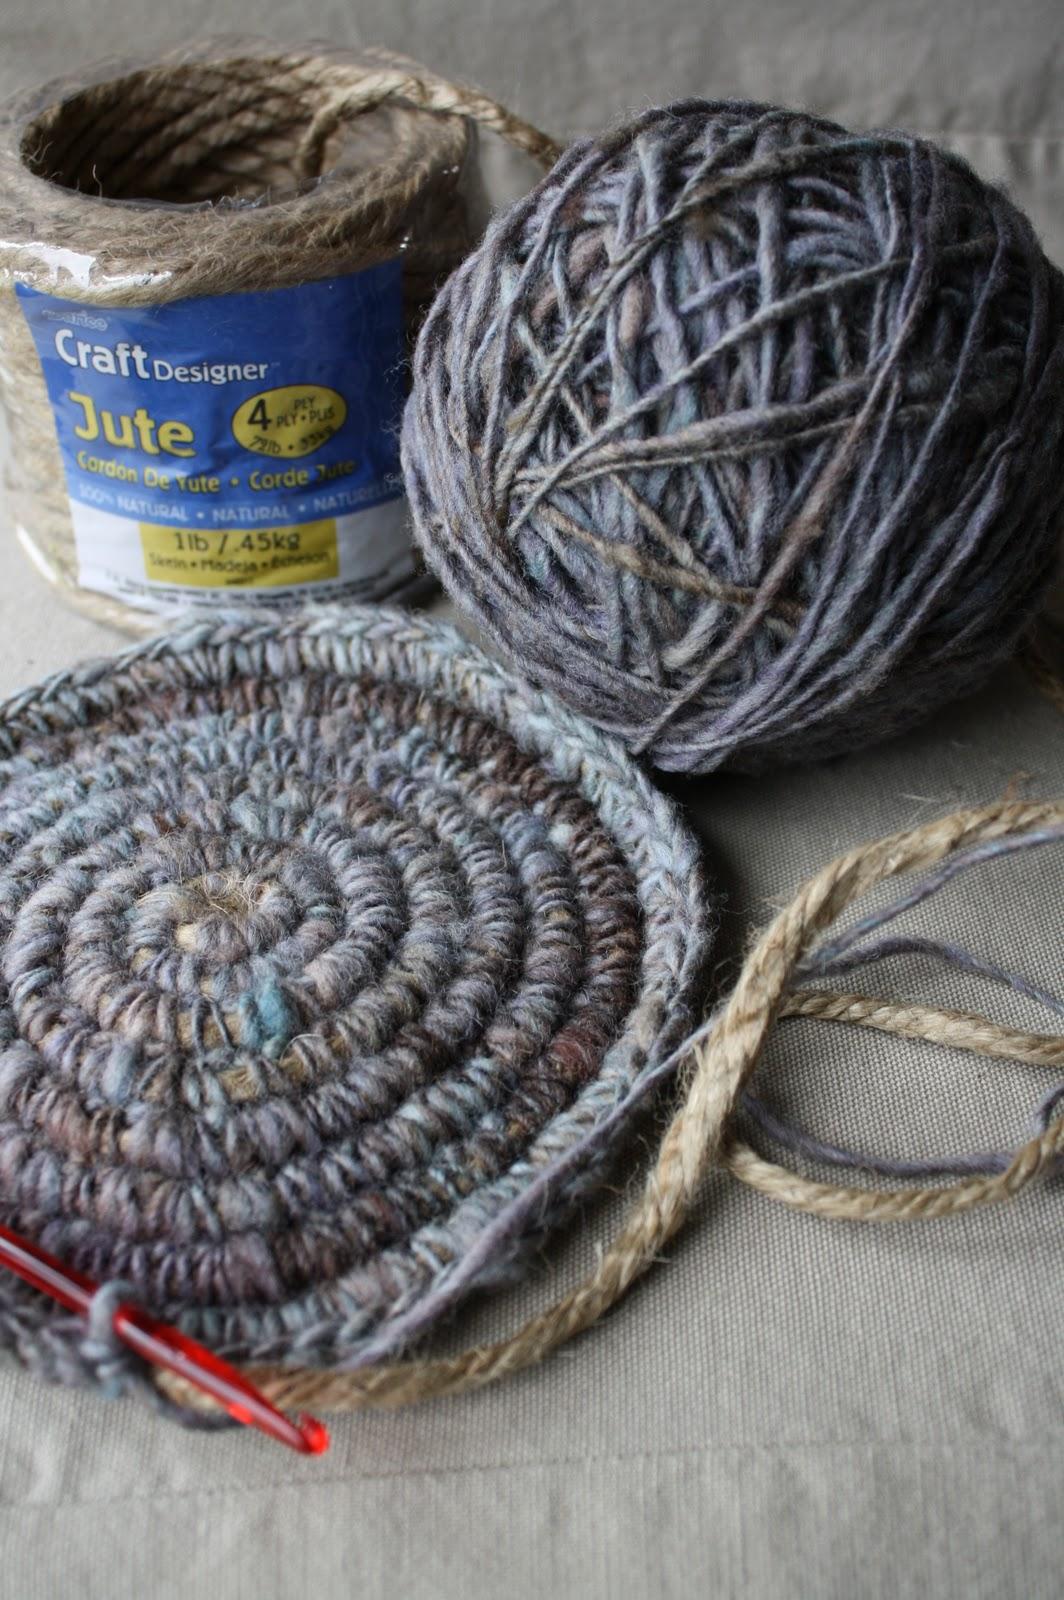 Crochet Donuts (Free Pattern) |Pinterest Crafts Crochet Patterns